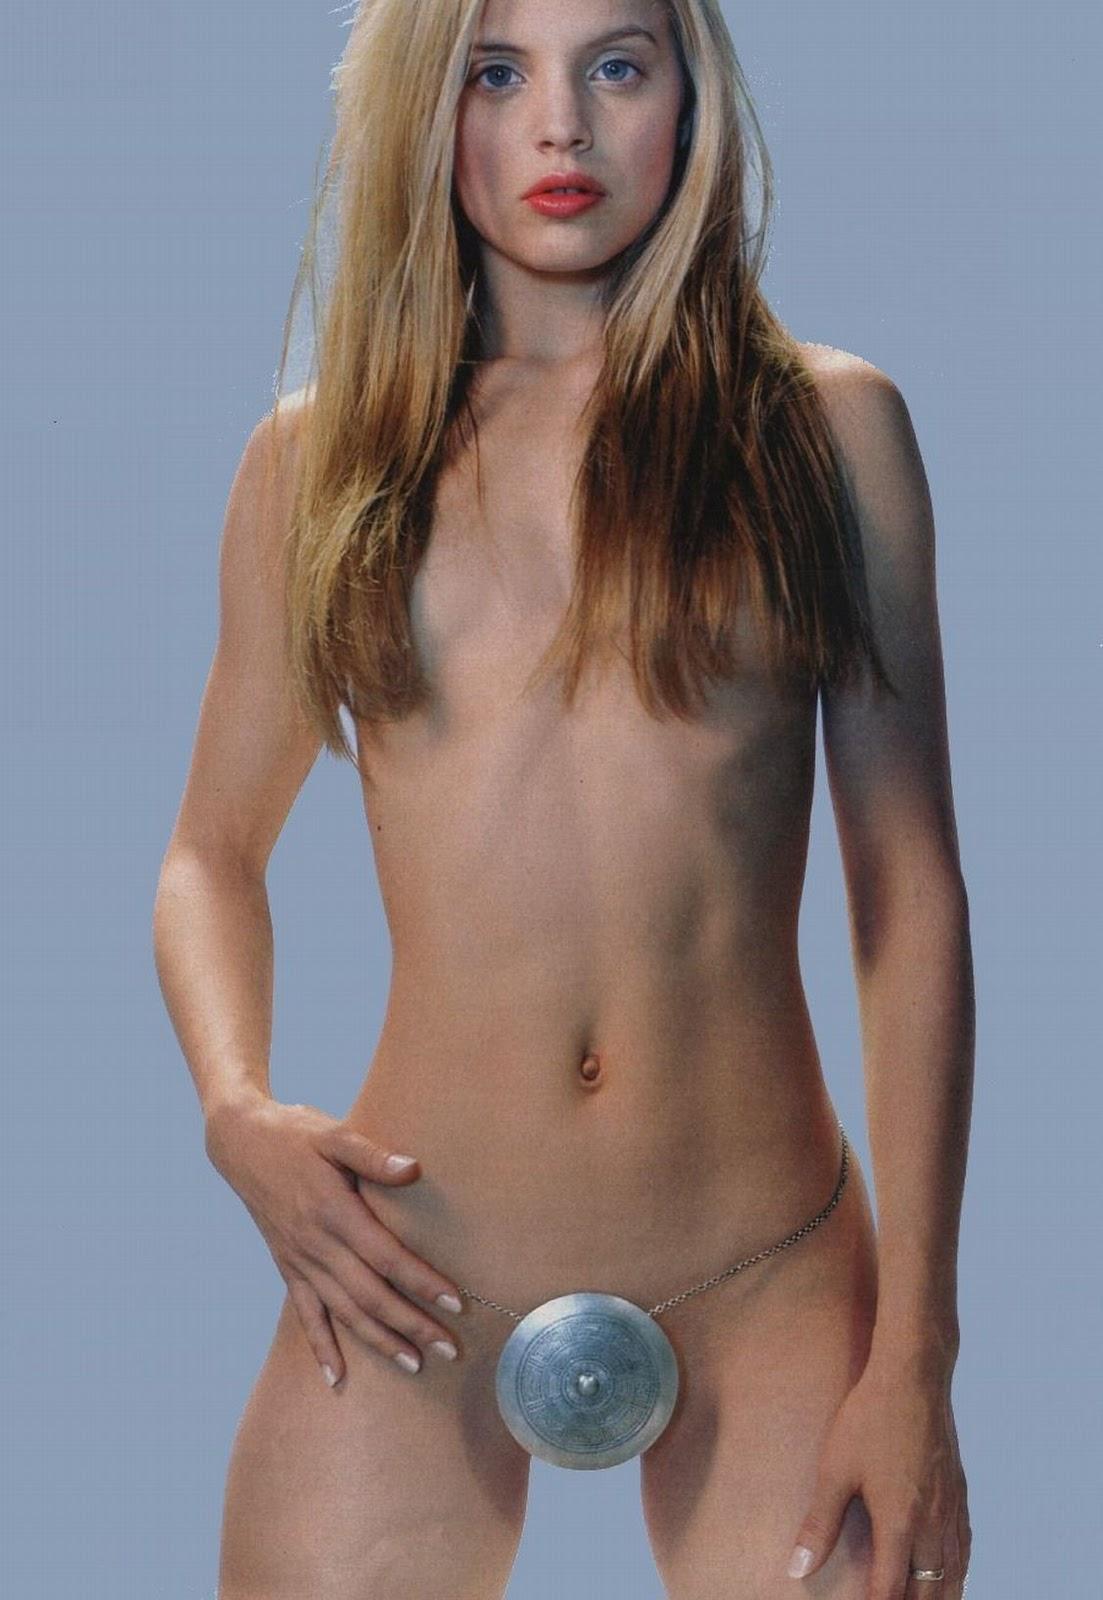 http://3.bp.blogspot.com/-rywx-ik5lPc/TnejEmO7pGI/AAAAAAAAHwU/1DDy0eTmtnQ/s1600/Mena+Suvari+desnuda+en+fotos.jpg